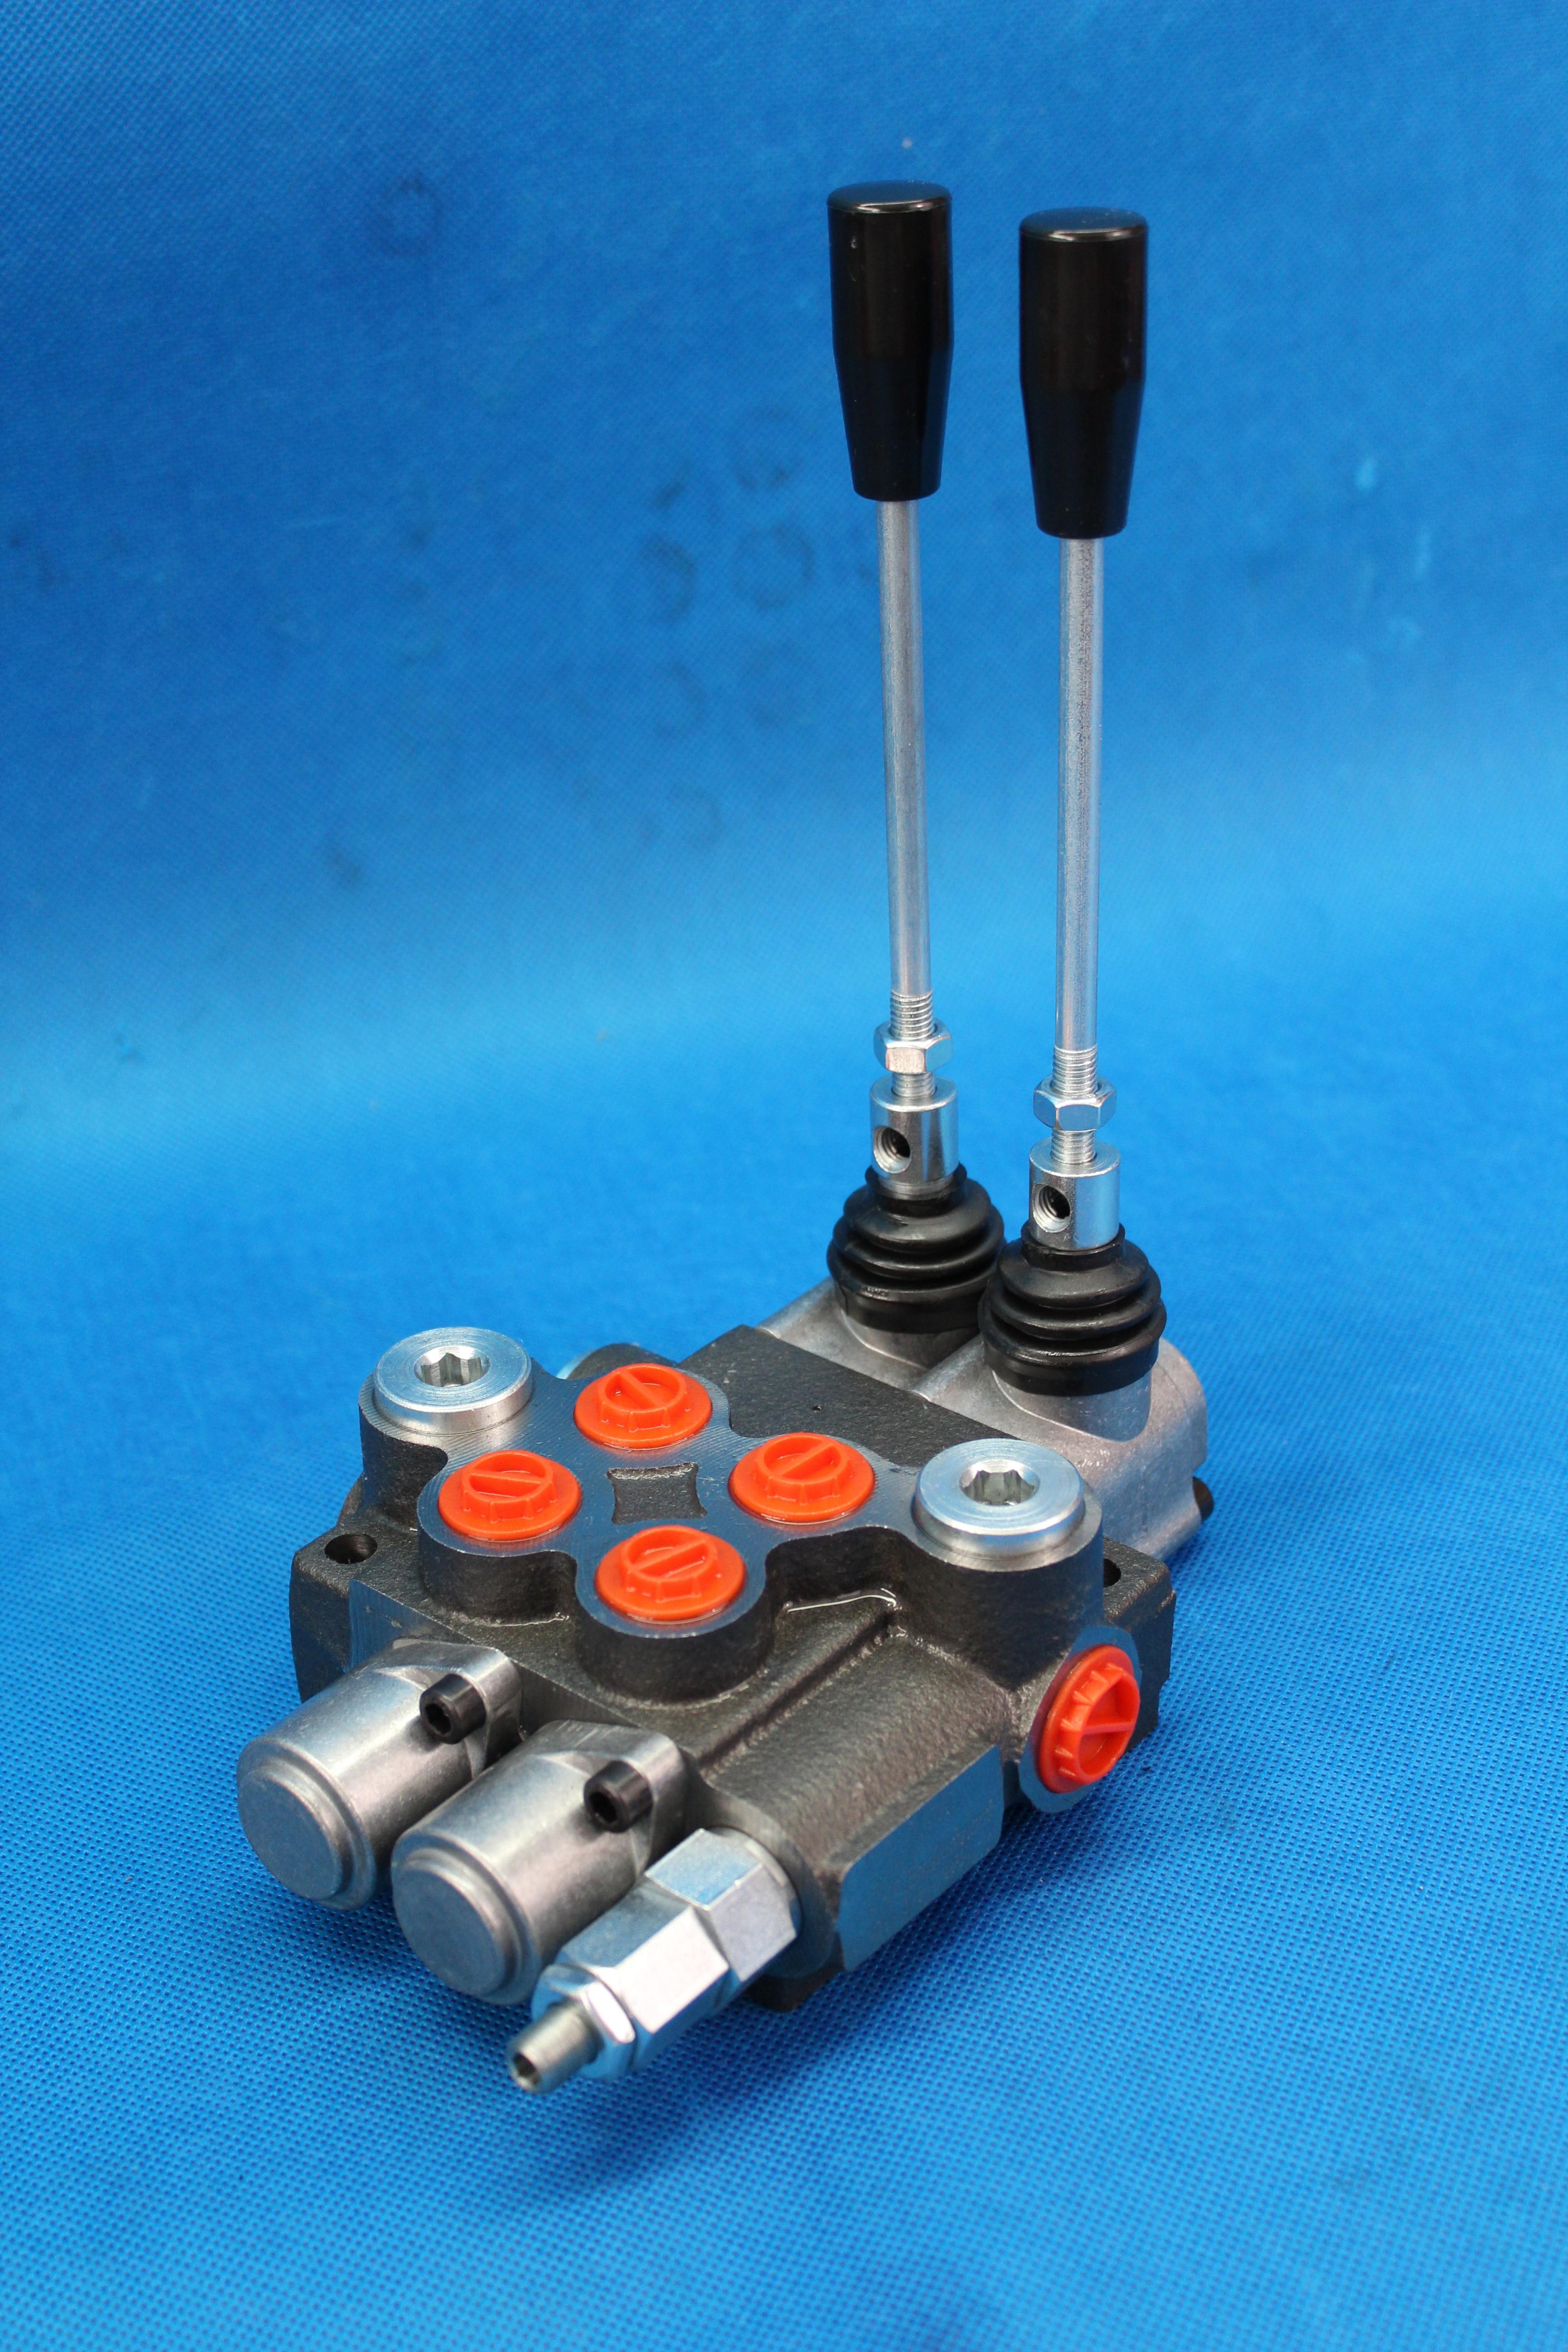 4 Spool Hydraulic Directional Control Valve 11Gpm 4300Psi Small Tractors 40l//min